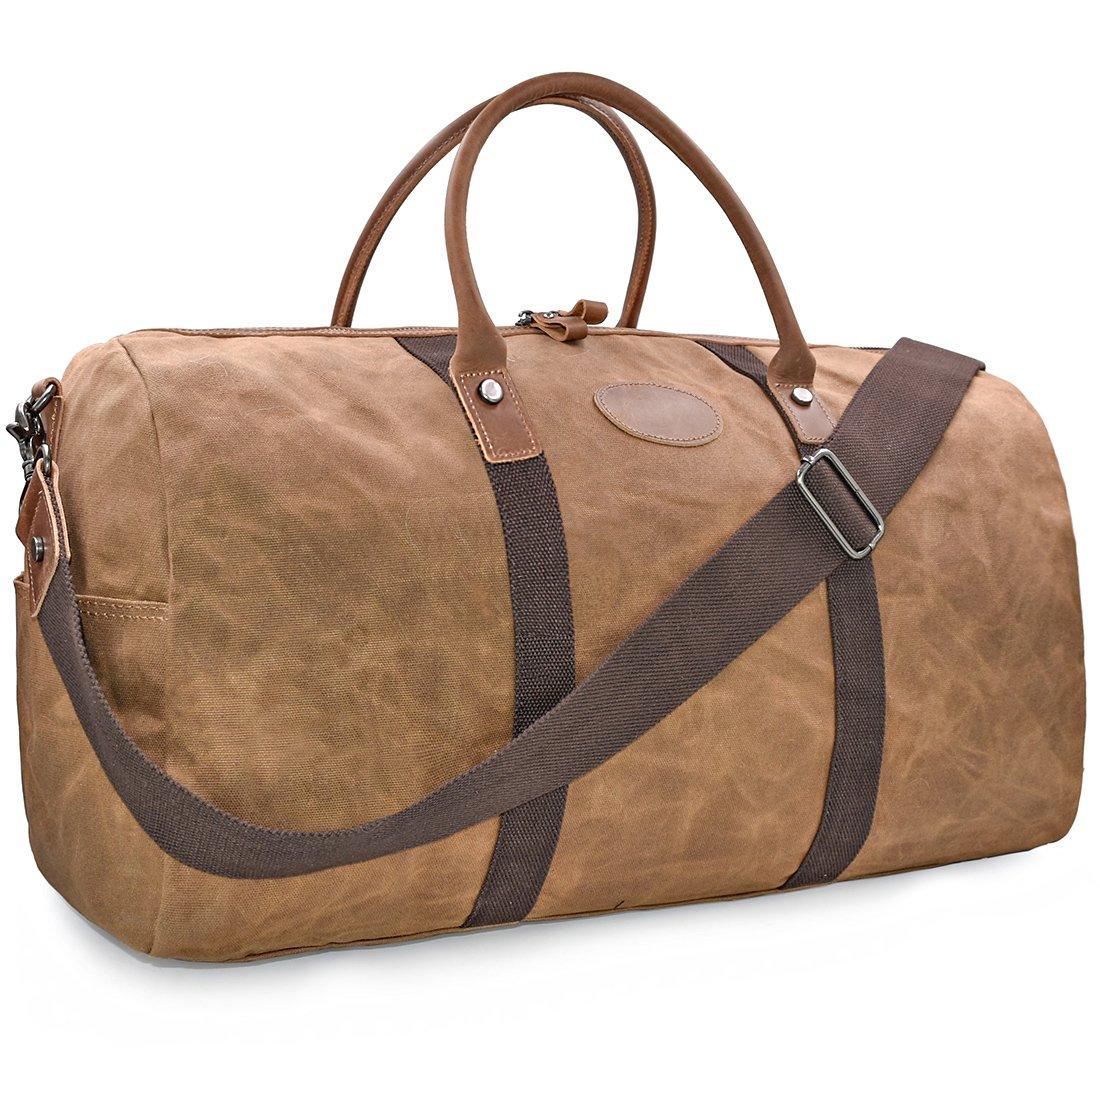 Travel Duffel Bag Waterproof Canvas Overnight Bag Leather Weekend Oversized Carryon Handbag Brown